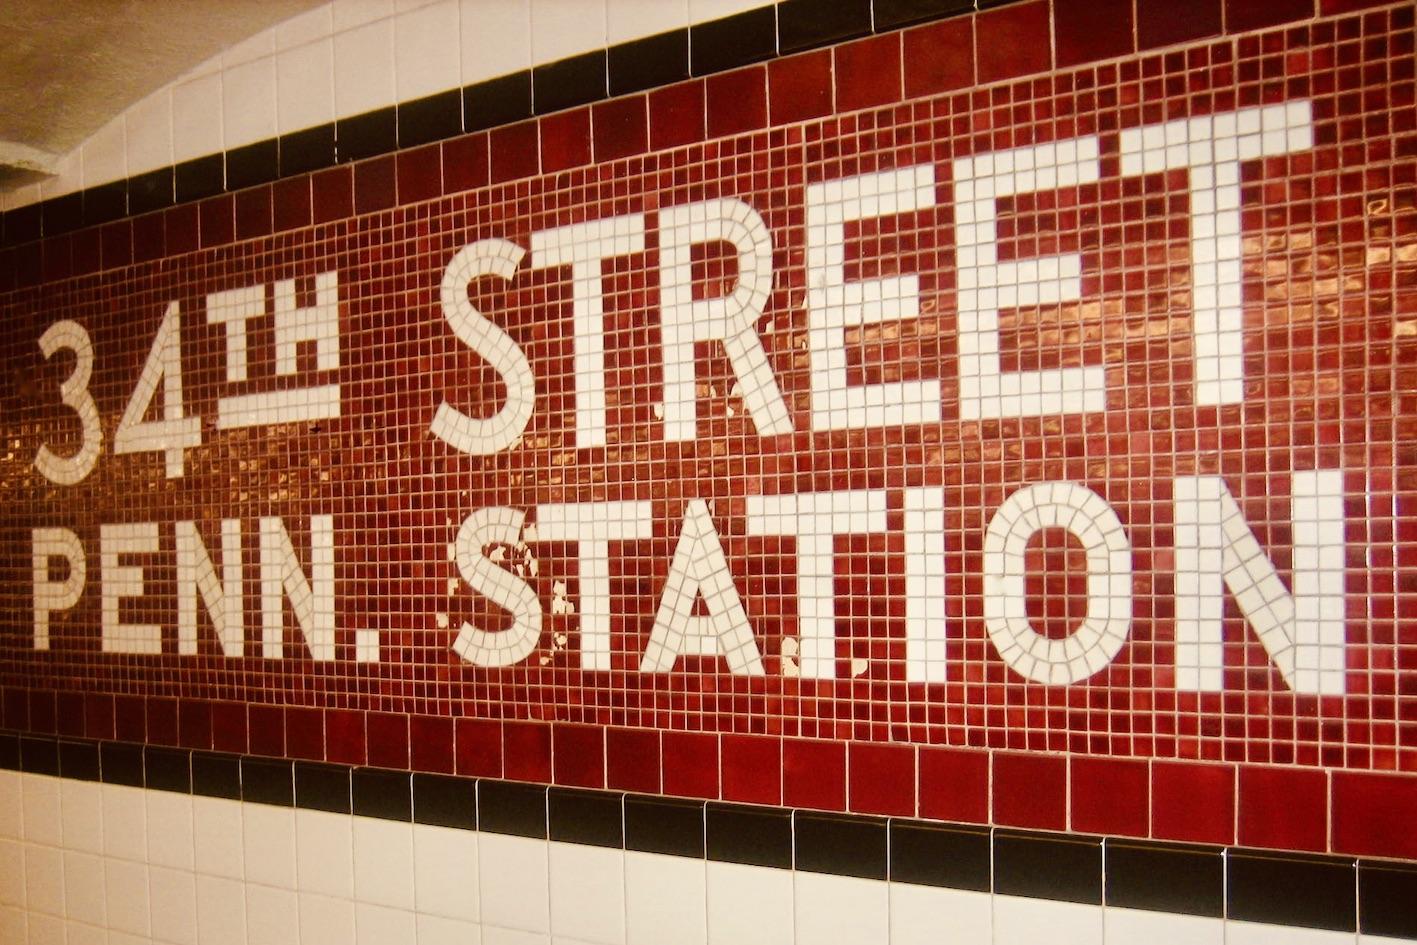 34th Street Penn Station sign NYC.